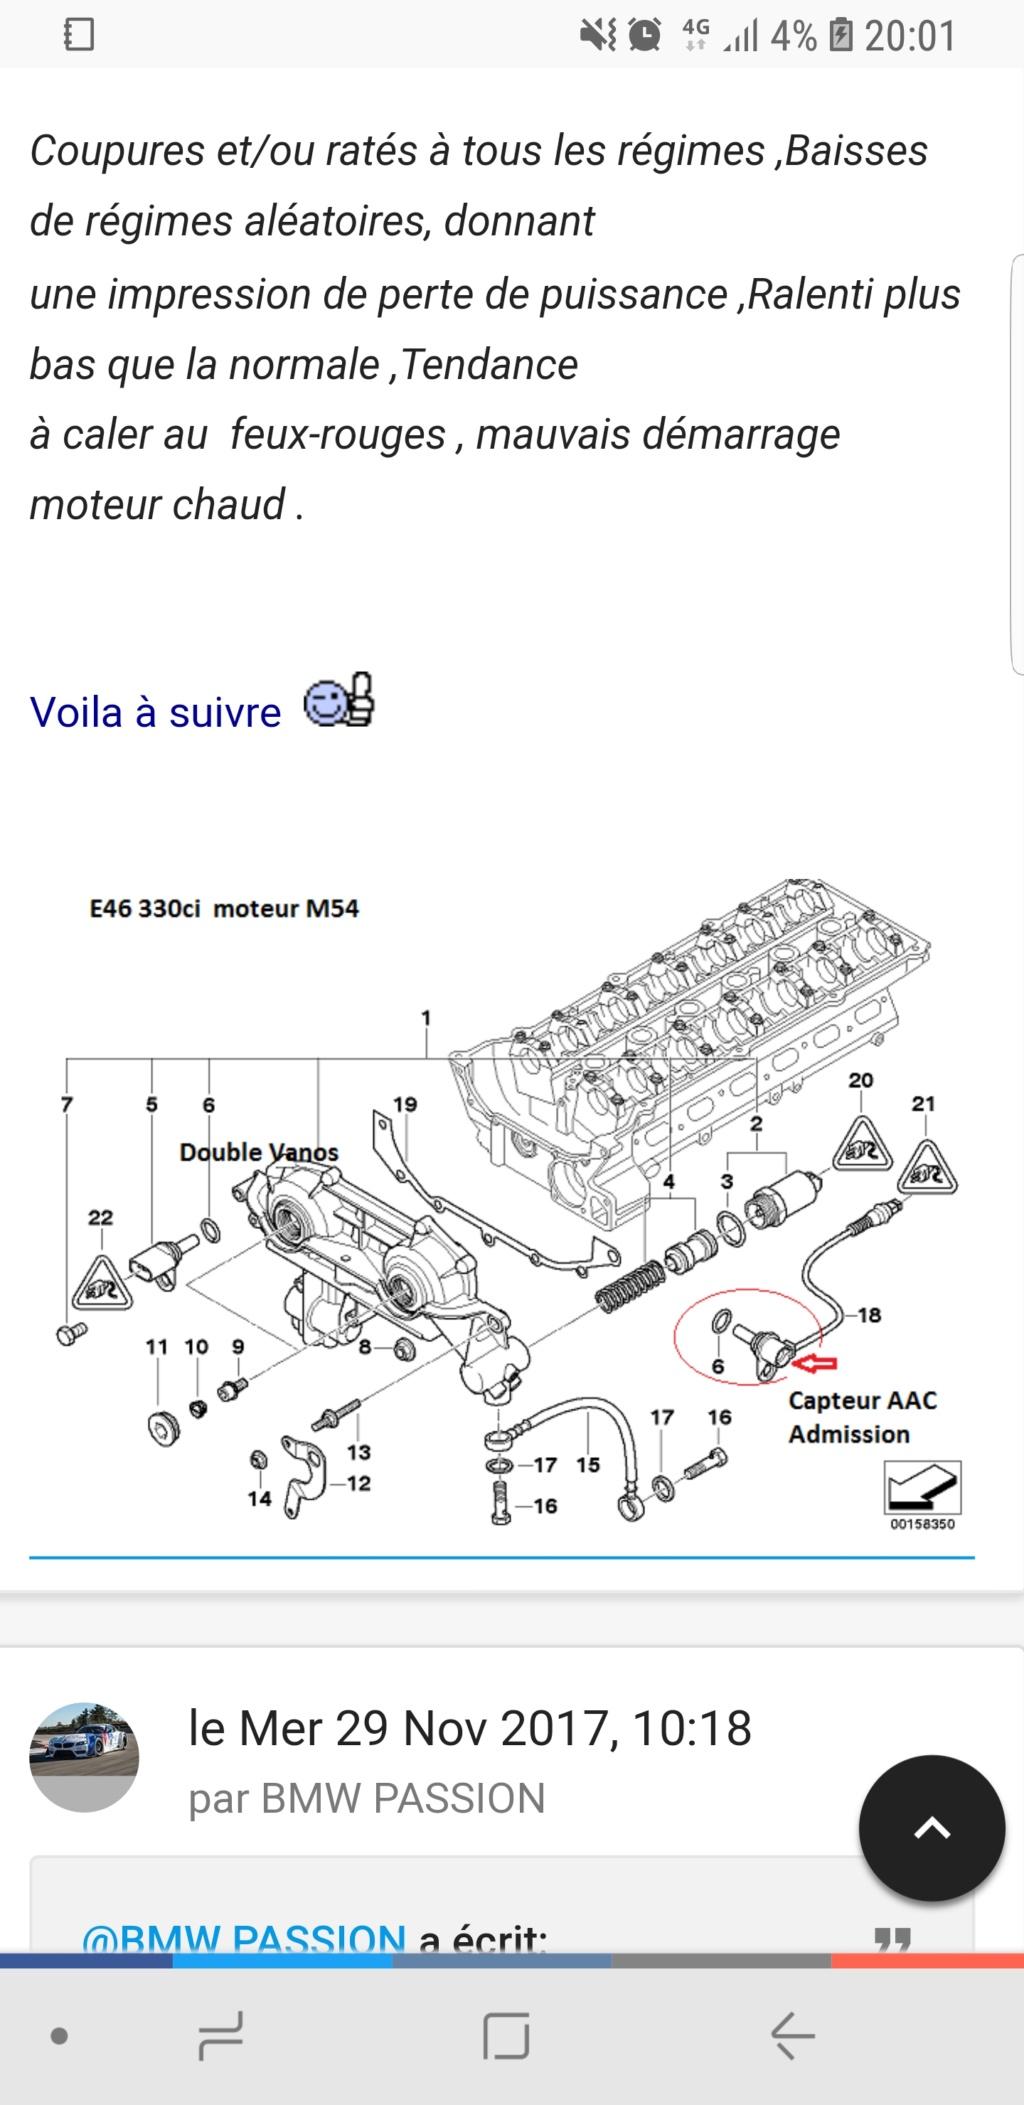 [ BMW E46 330ci an 2001 ] A quoi sert cette pièce ? Screen10